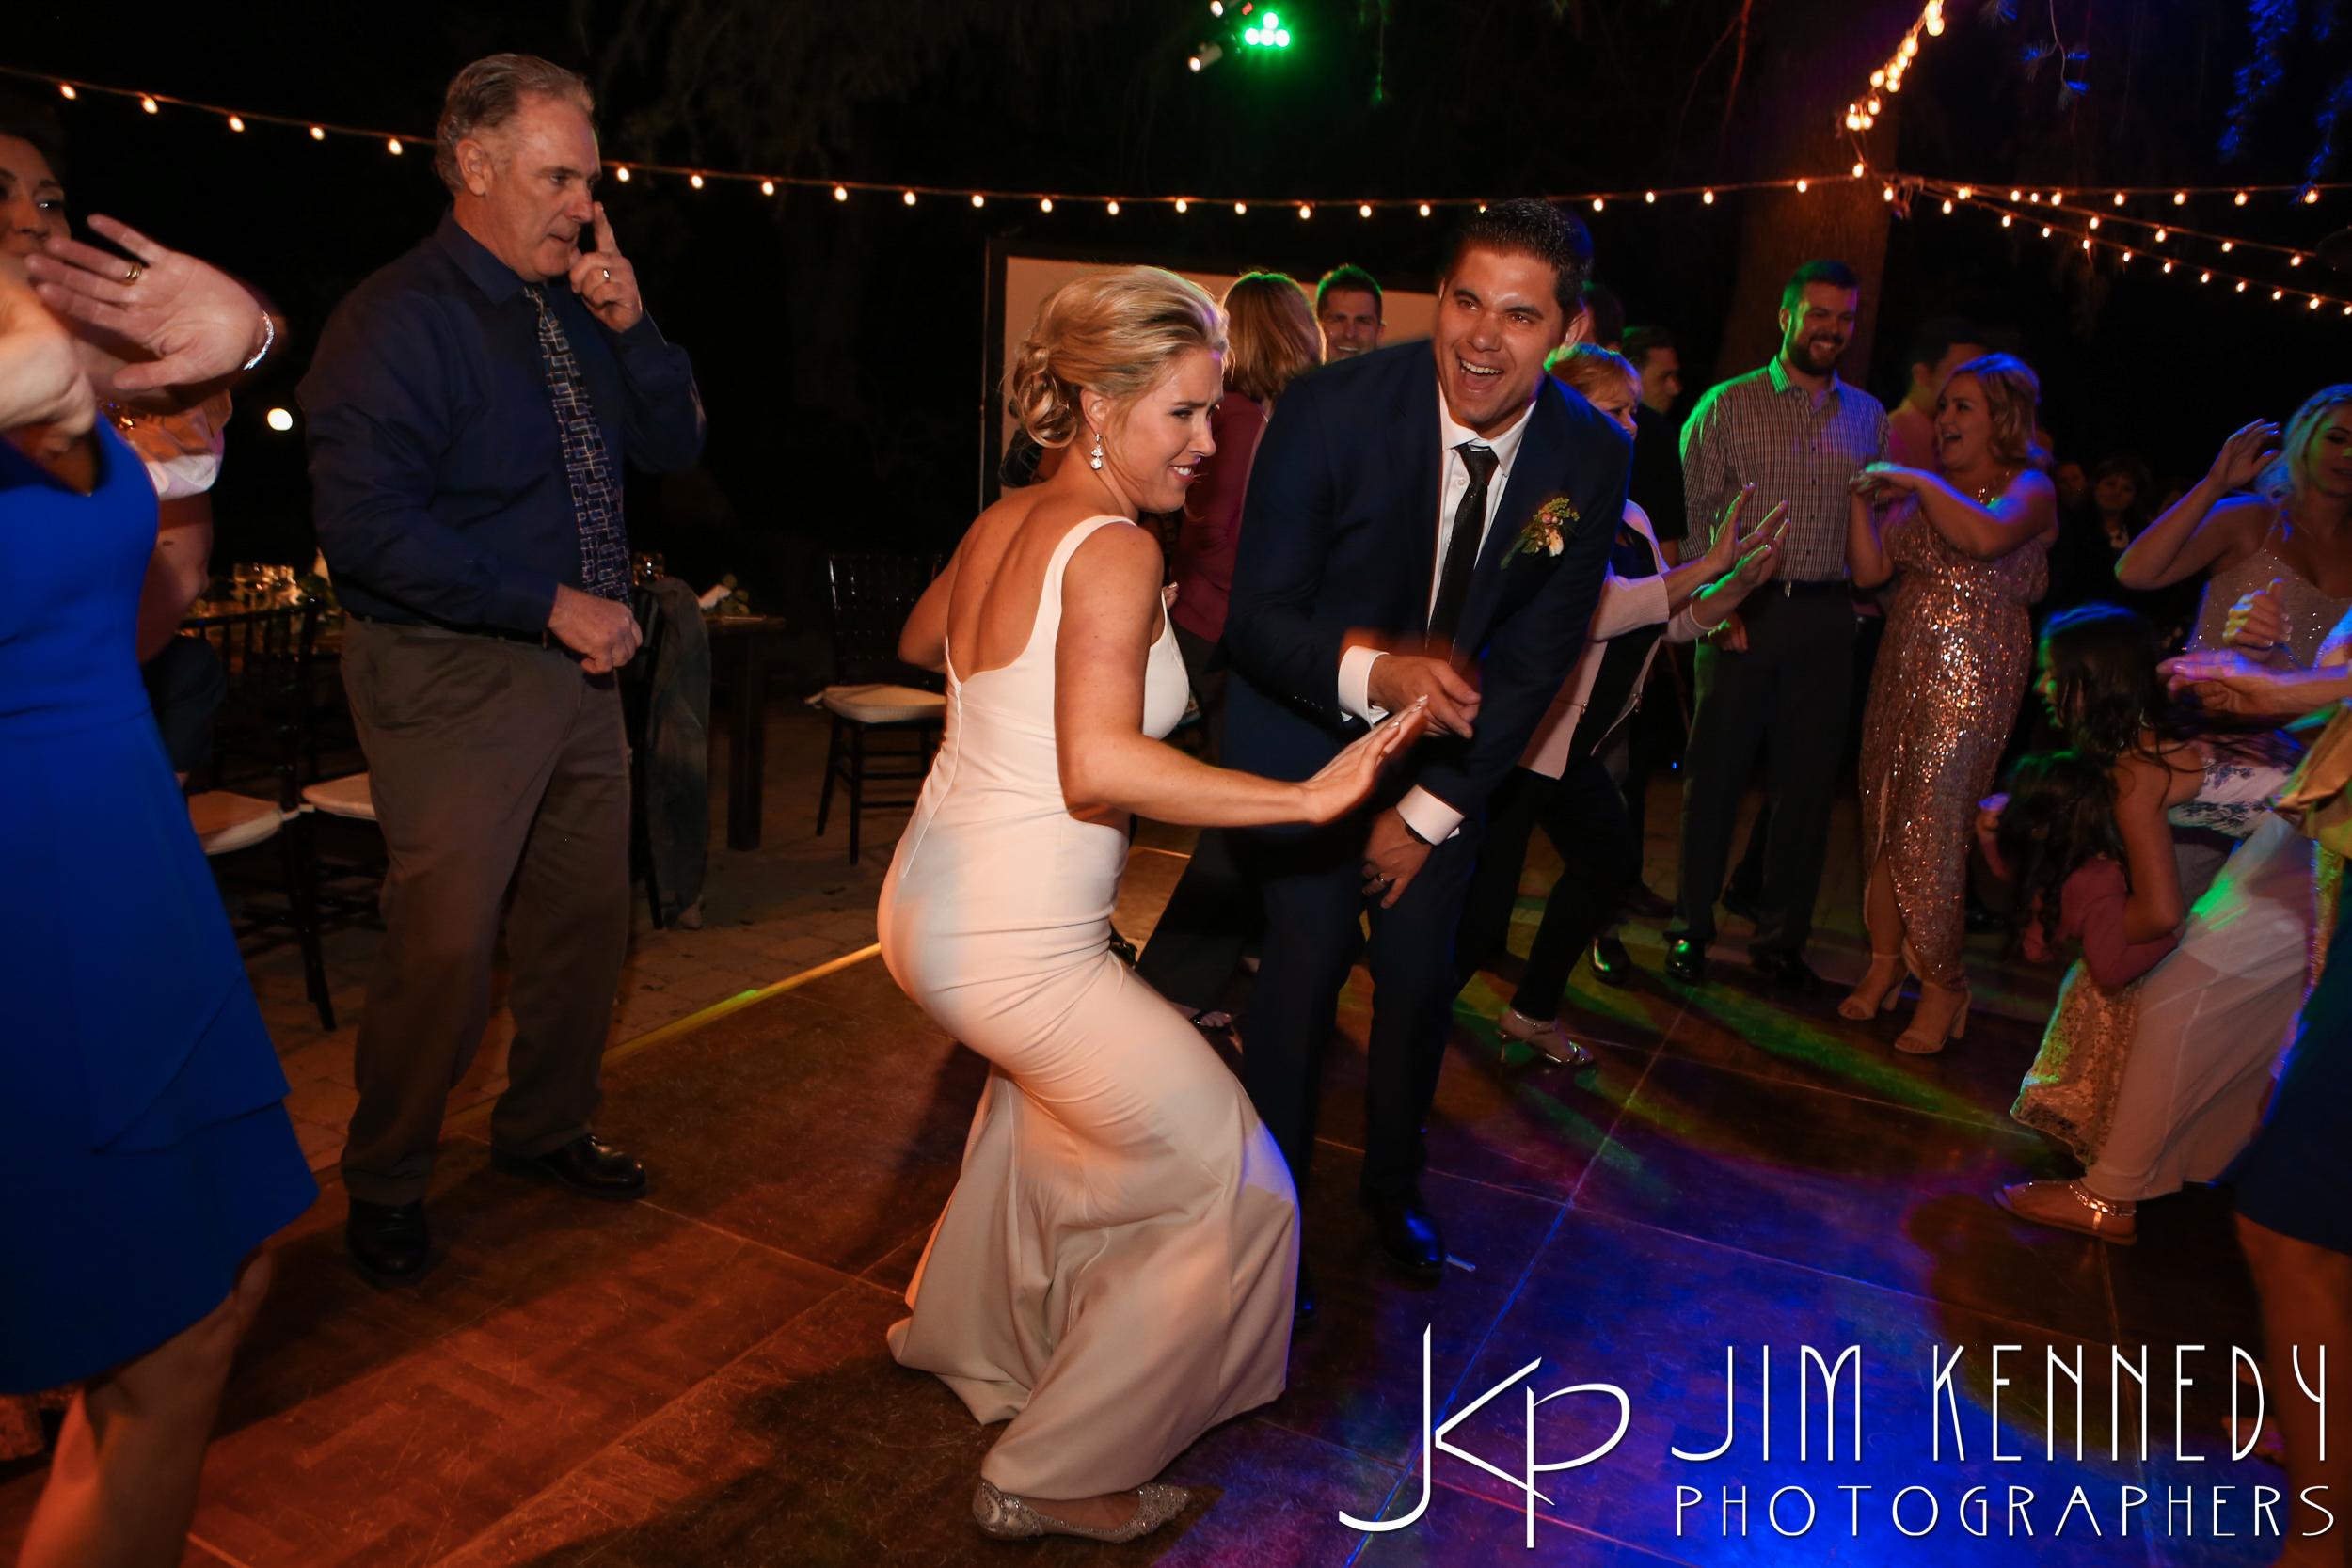 jim_kennedy_photographers_highland_springs_wedding_caitlyn_0201.jpg